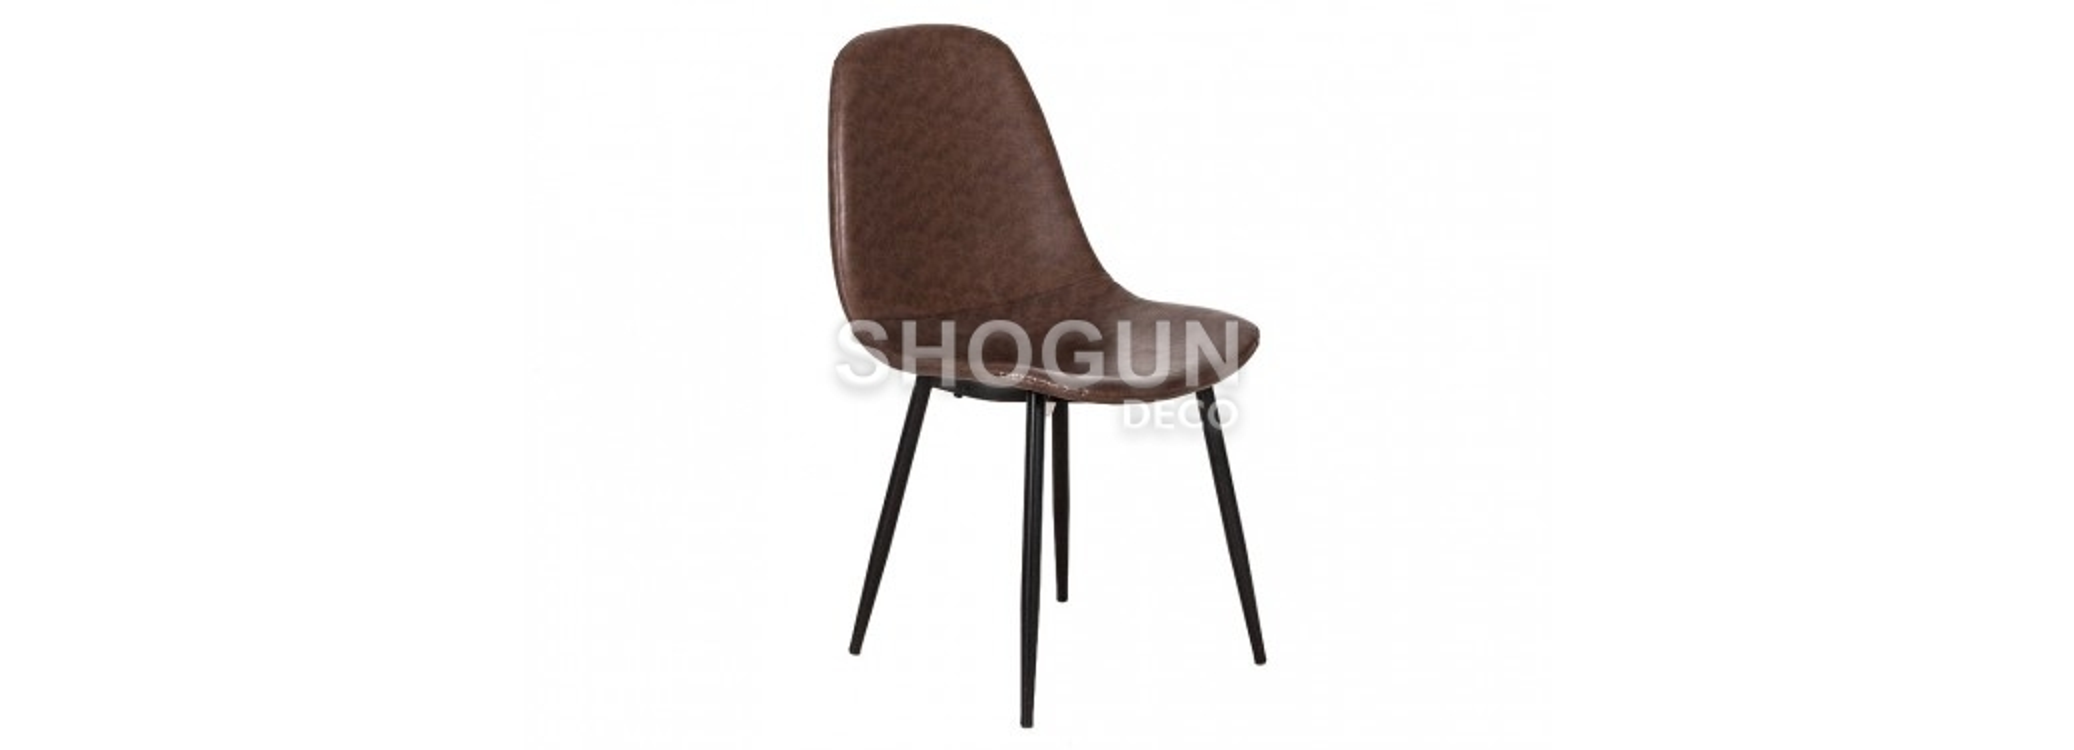 Chaise en simili marron